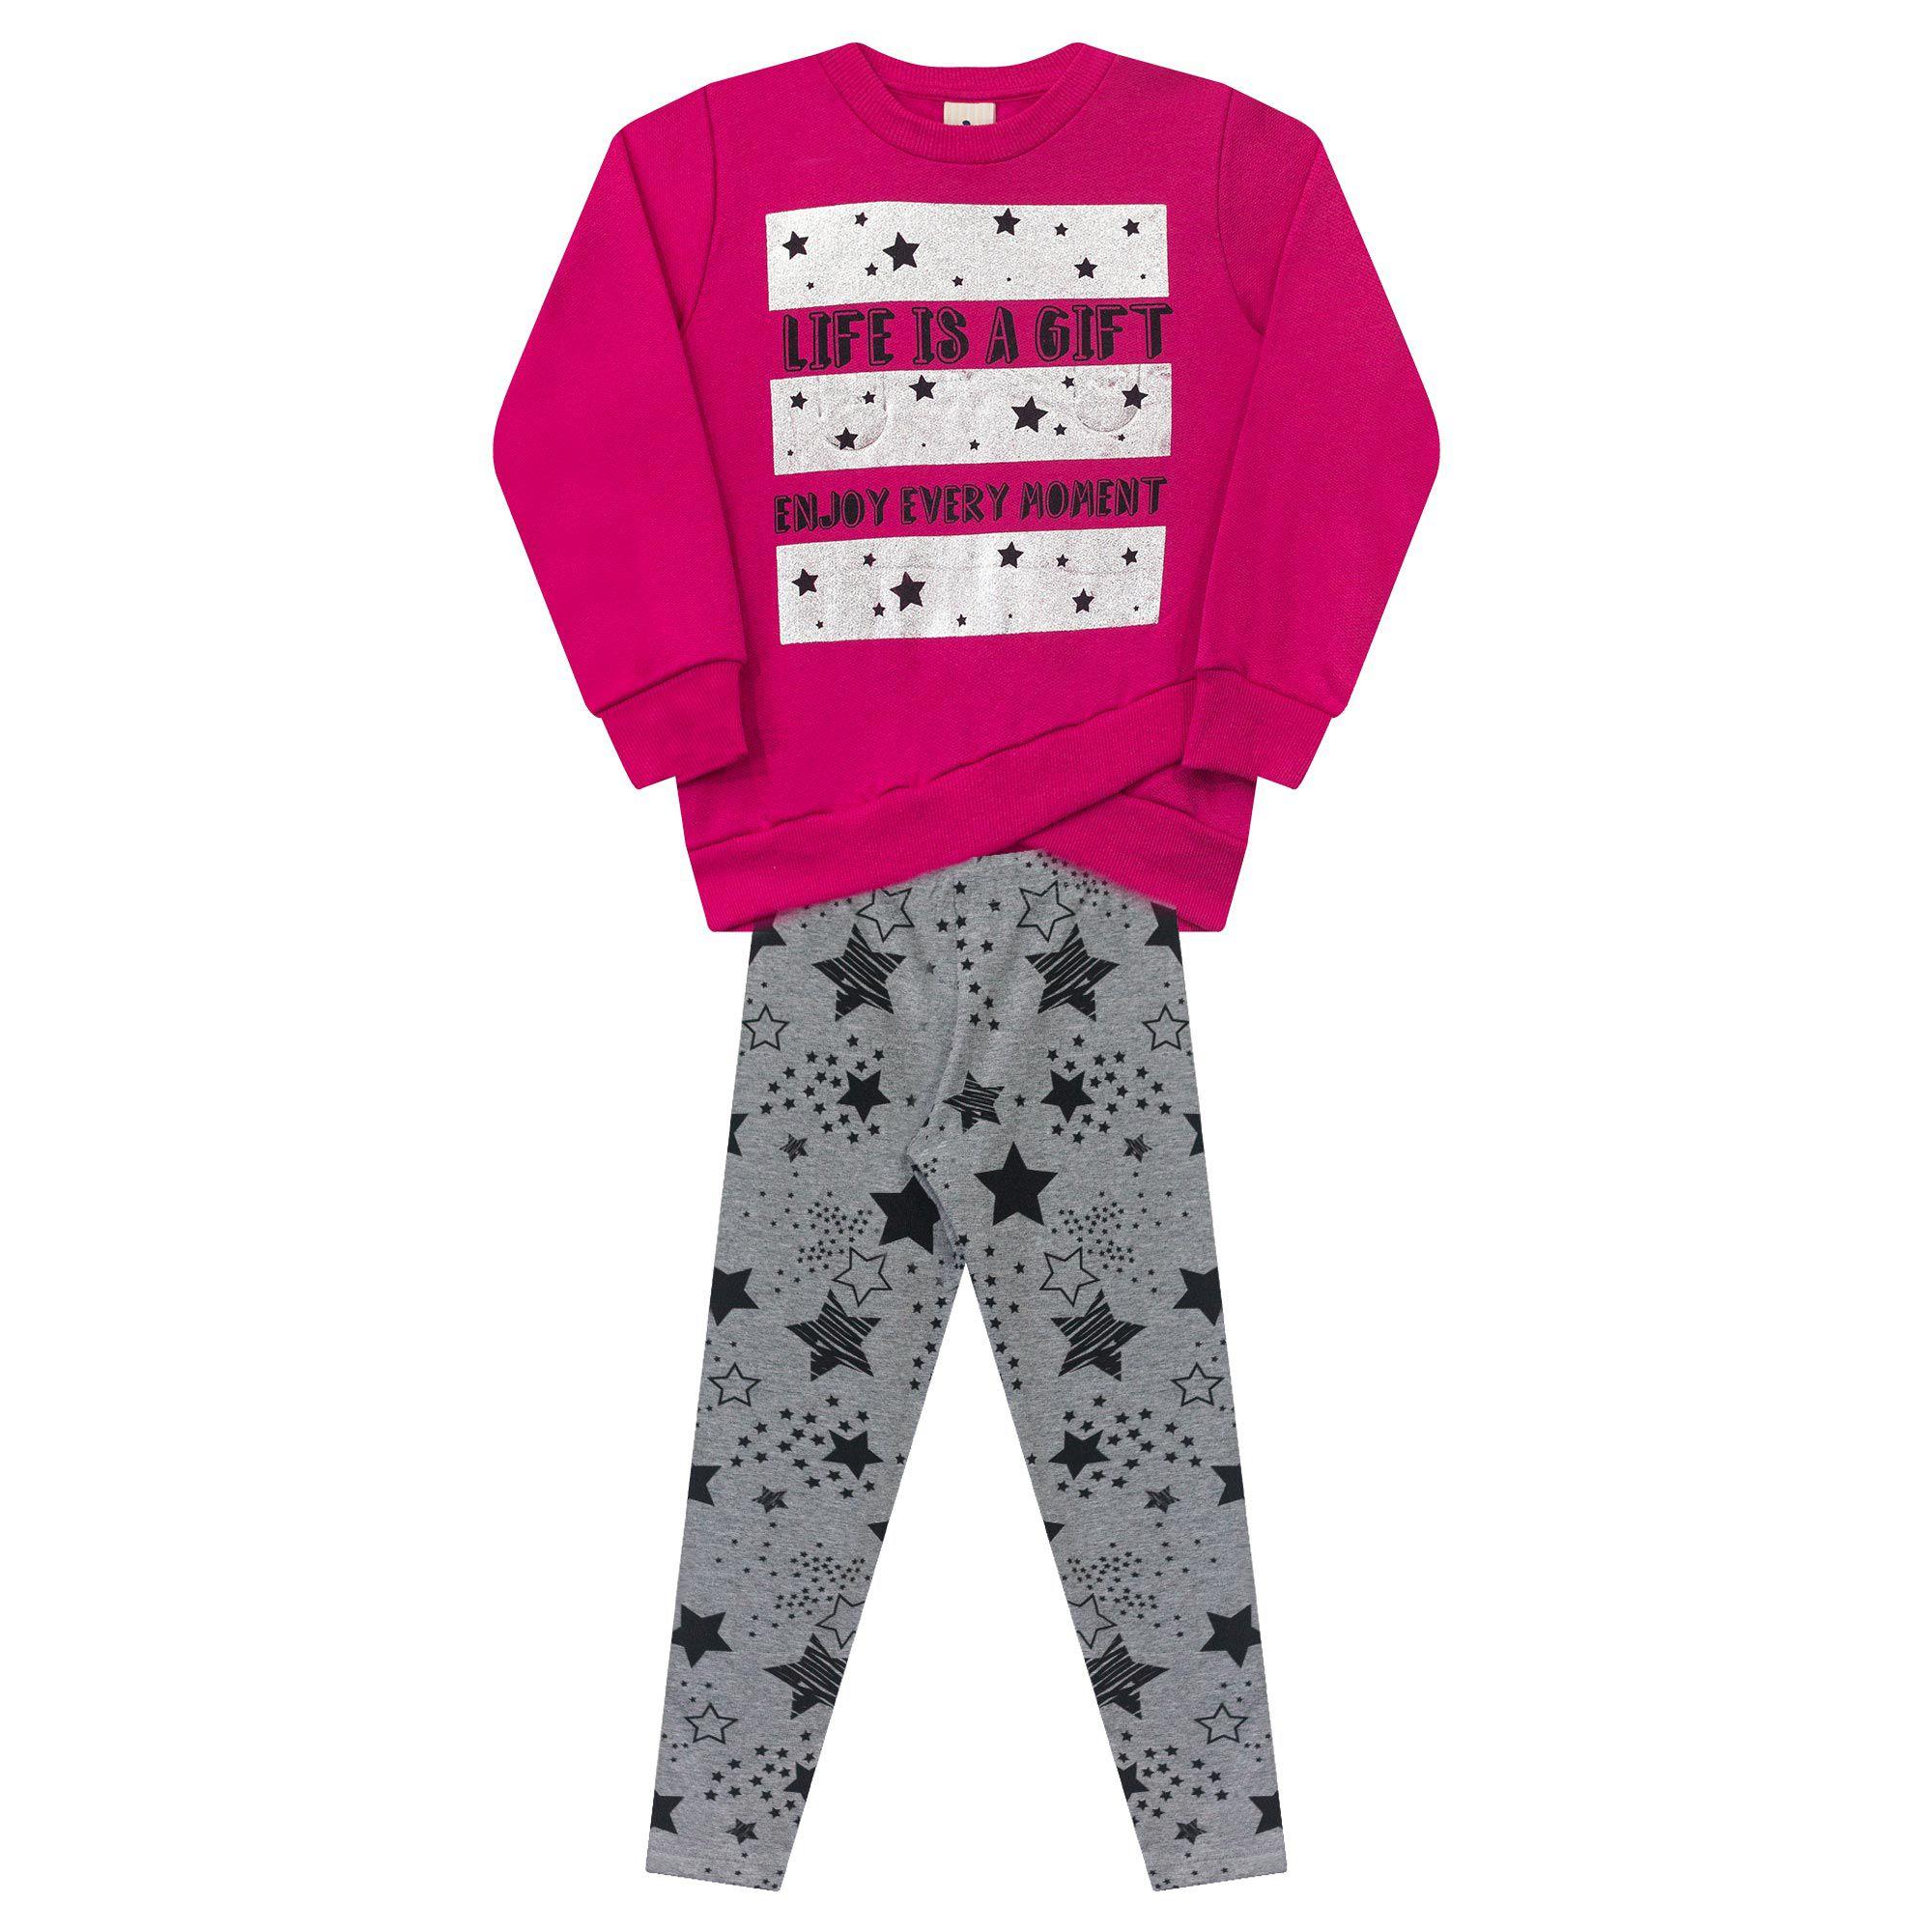 Conjunto Infantil Casaco e Legging  - Ref 4991 - Pink/Mescla